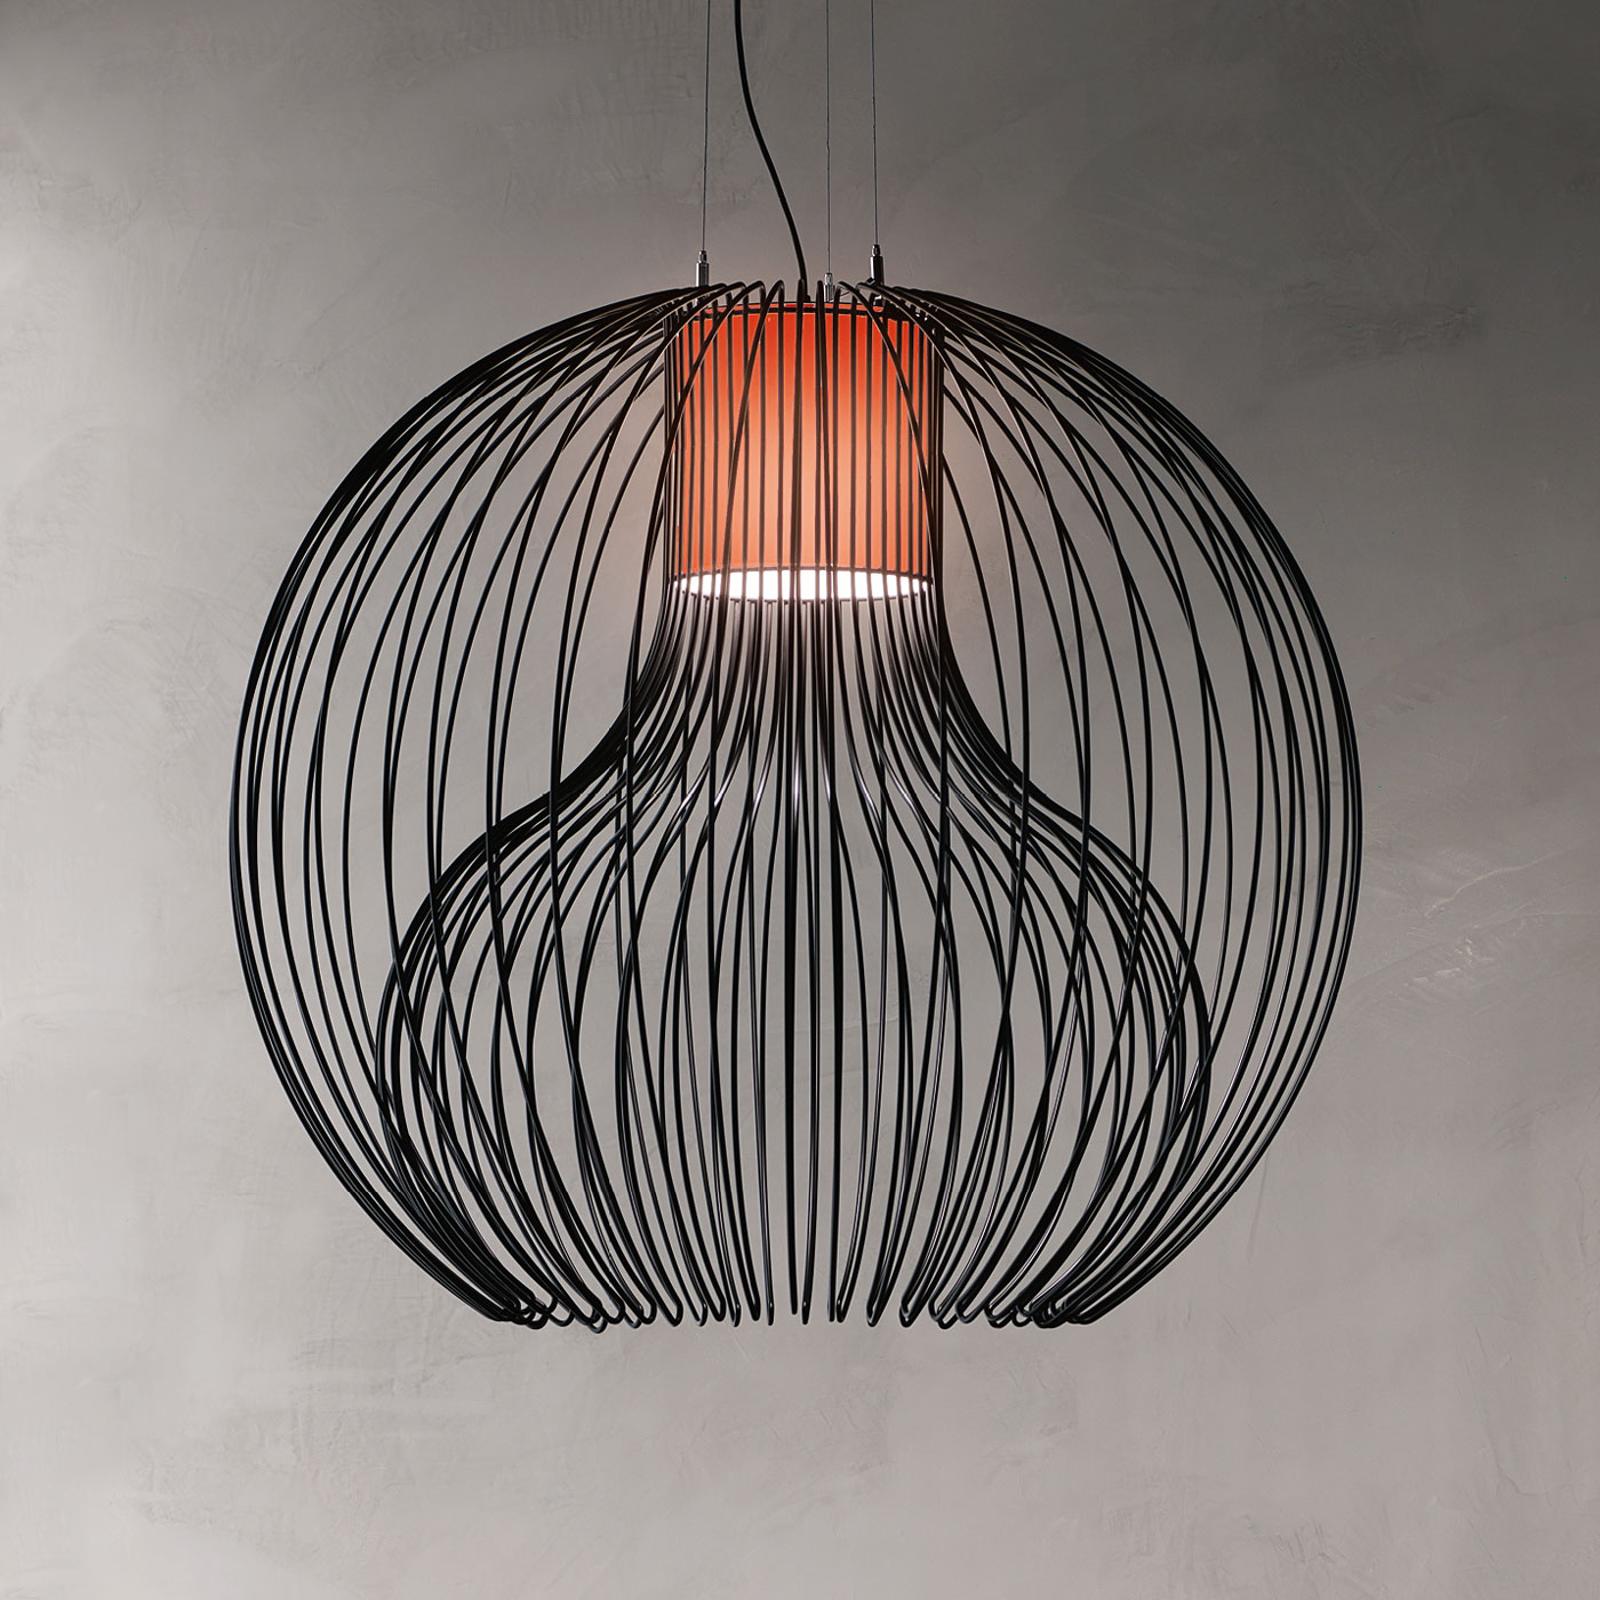 Modo Luce Icaro Ball hængelampe Ø 50 cm, sort